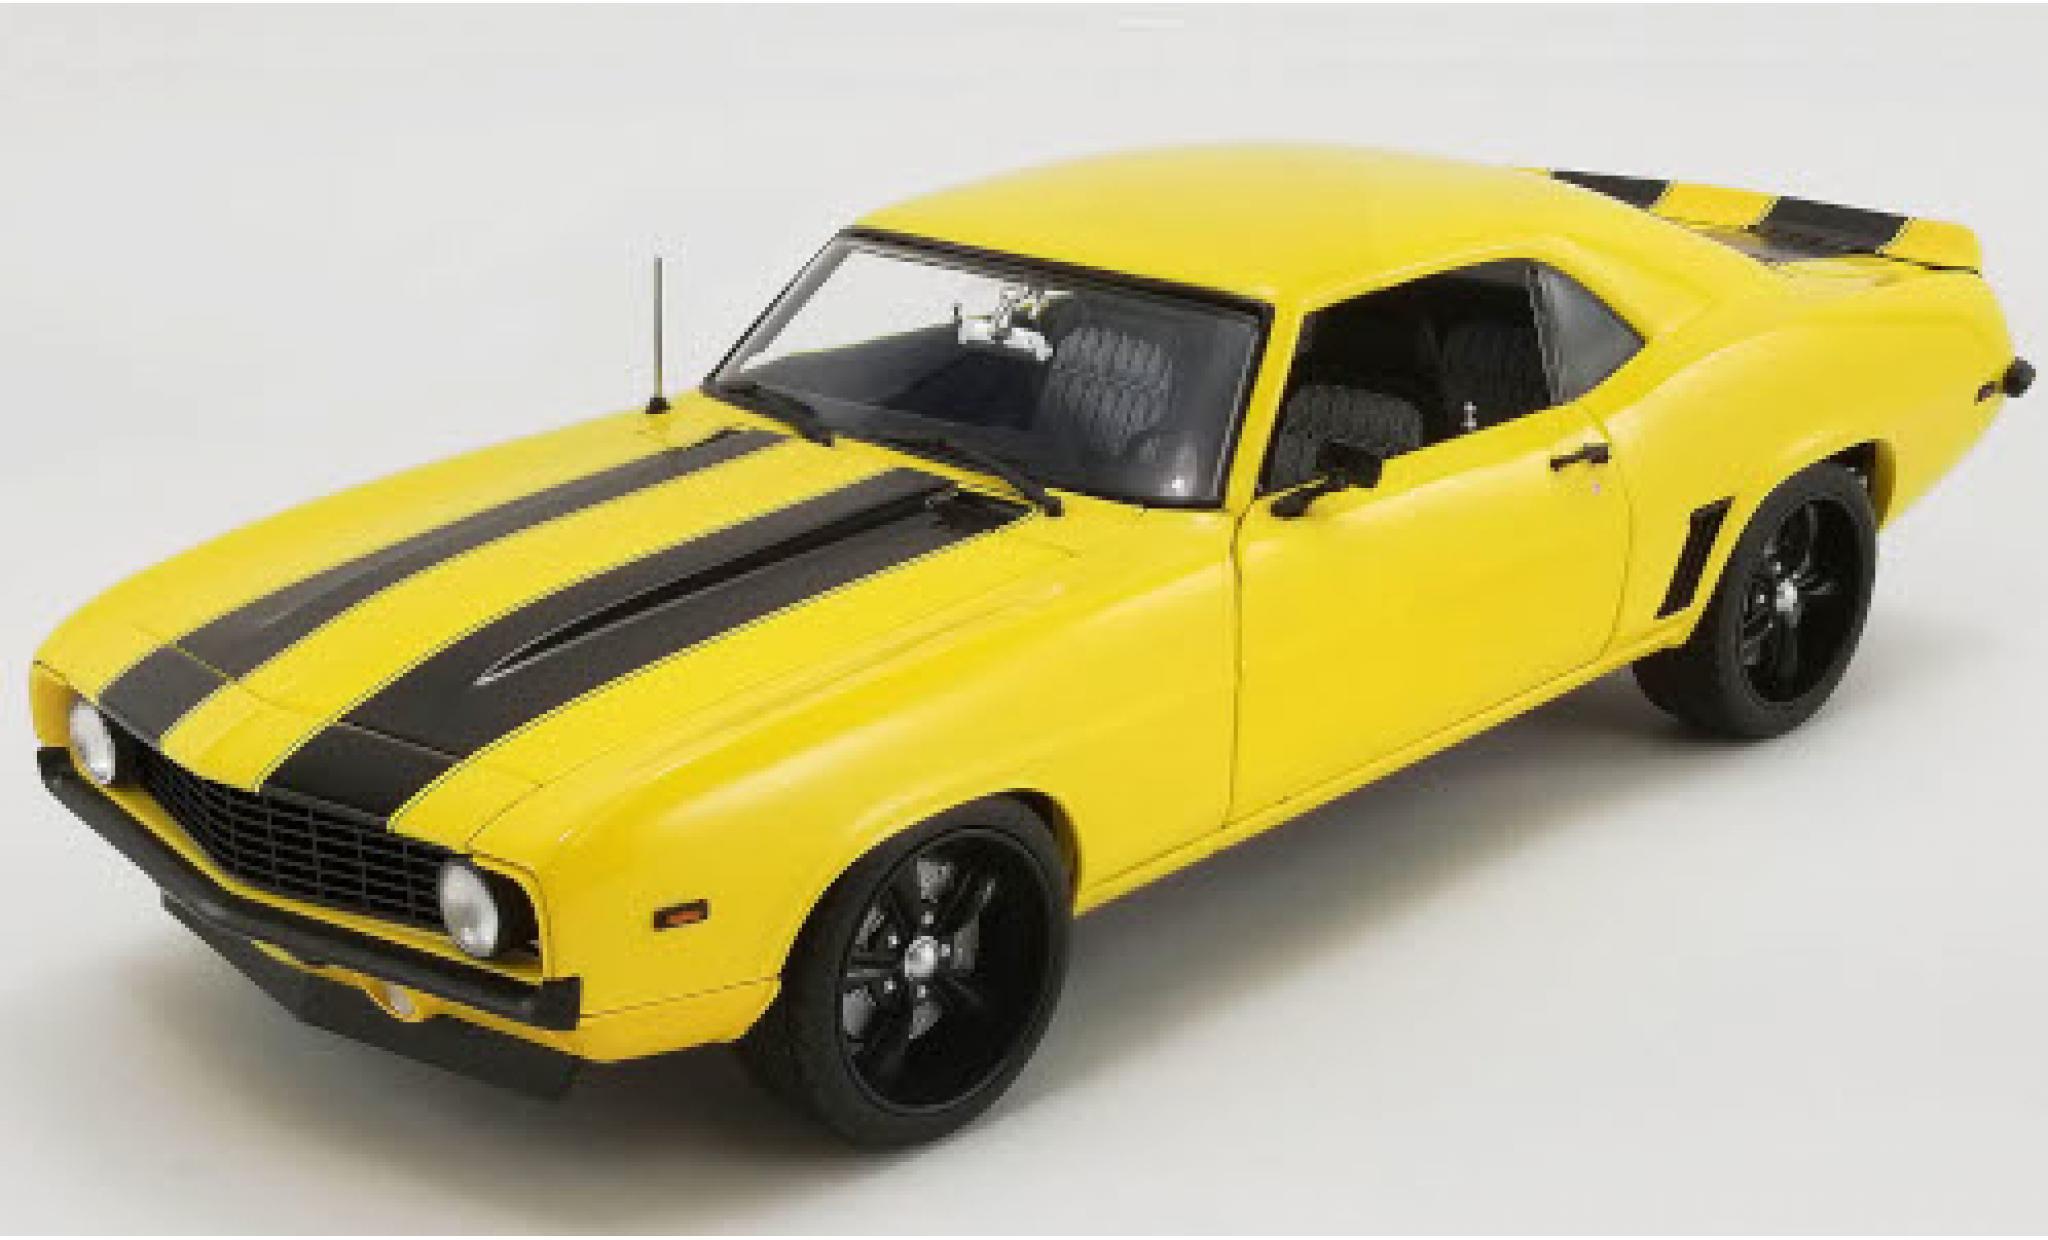 Chevrolet Camaro 1/18 ACME Street Fighter yellow/black 1969 Yellow Jacket